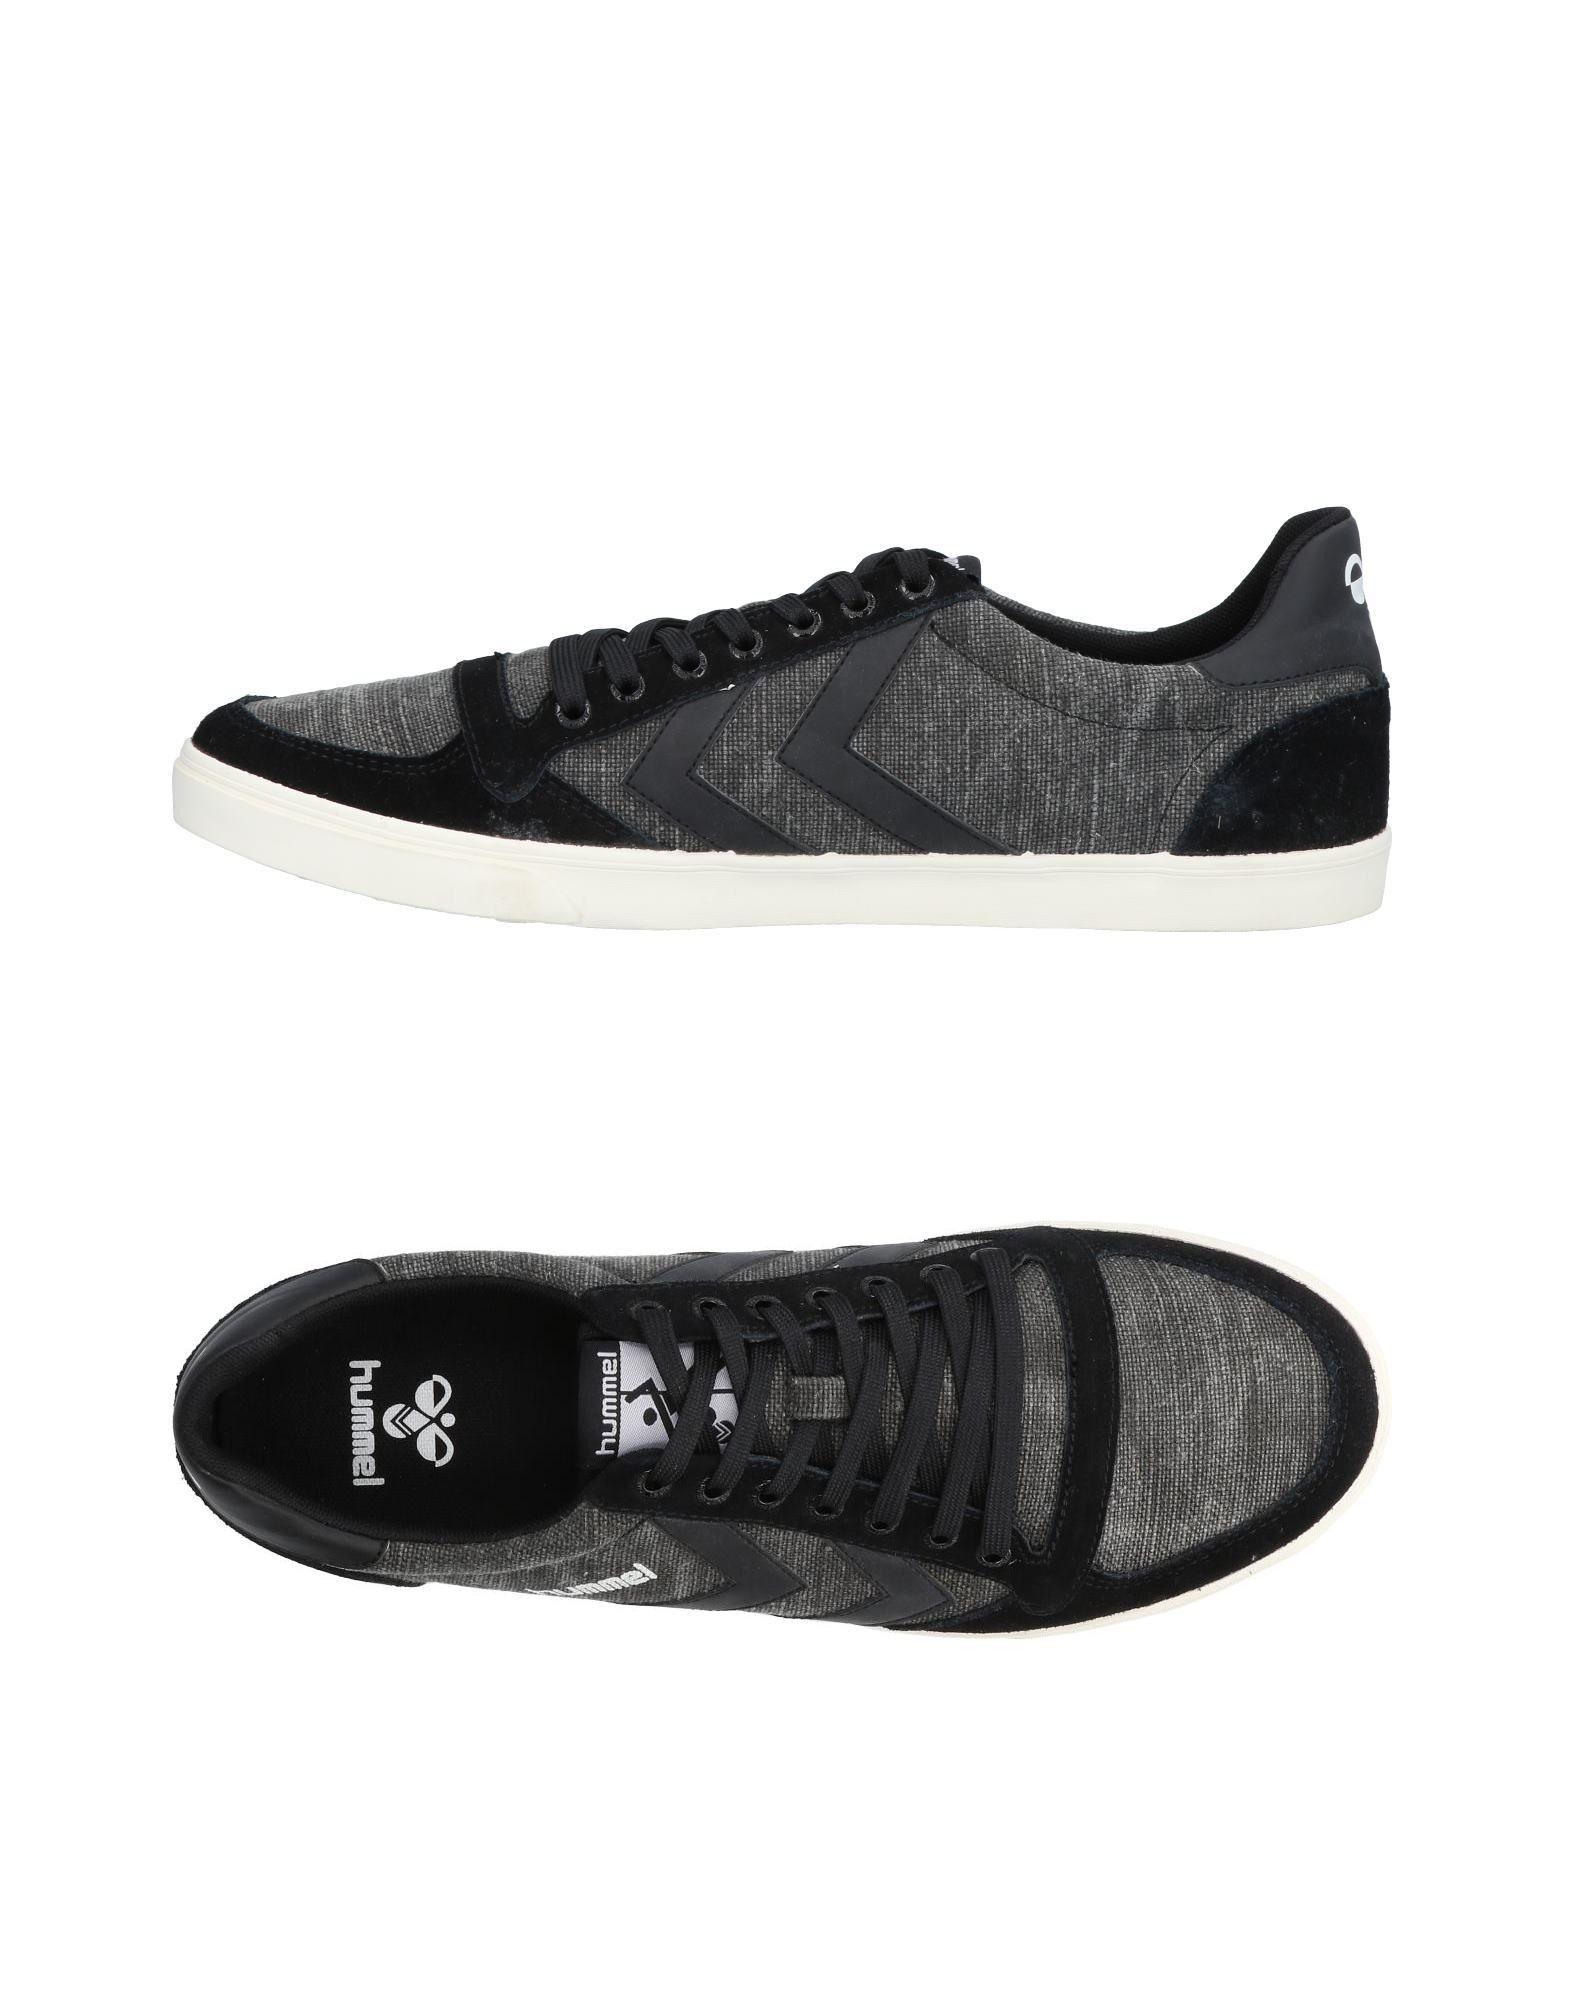 11415129IU Hummel Sneakers Herren  11415129IU  Heiße Schuhe a800c3